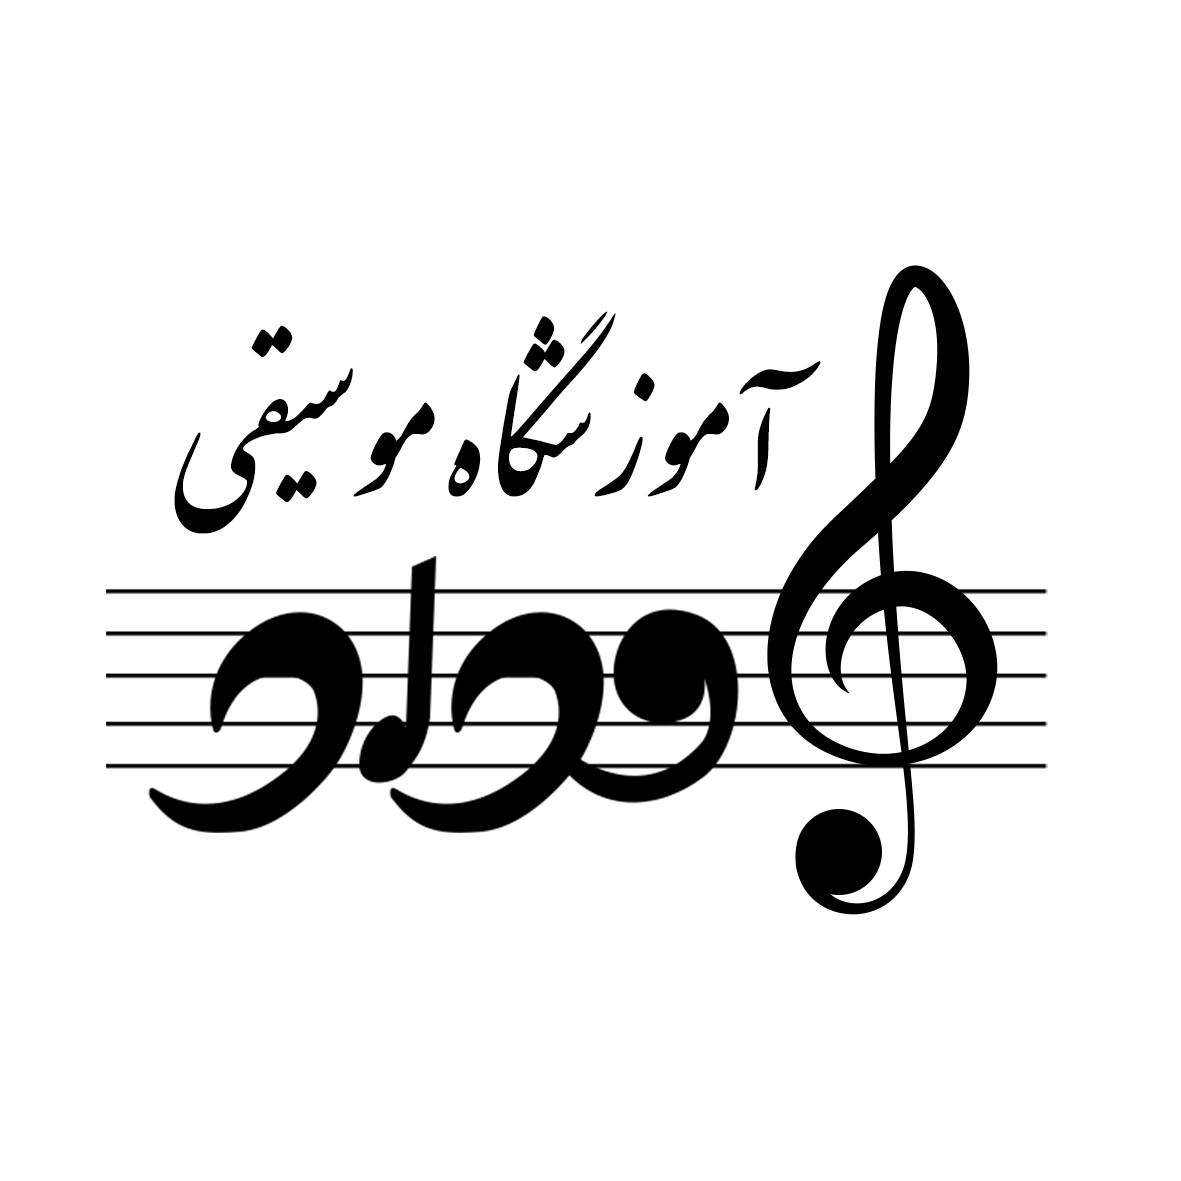 Photo of گروه و آموزشگاه موسیقی بامداد مشهد